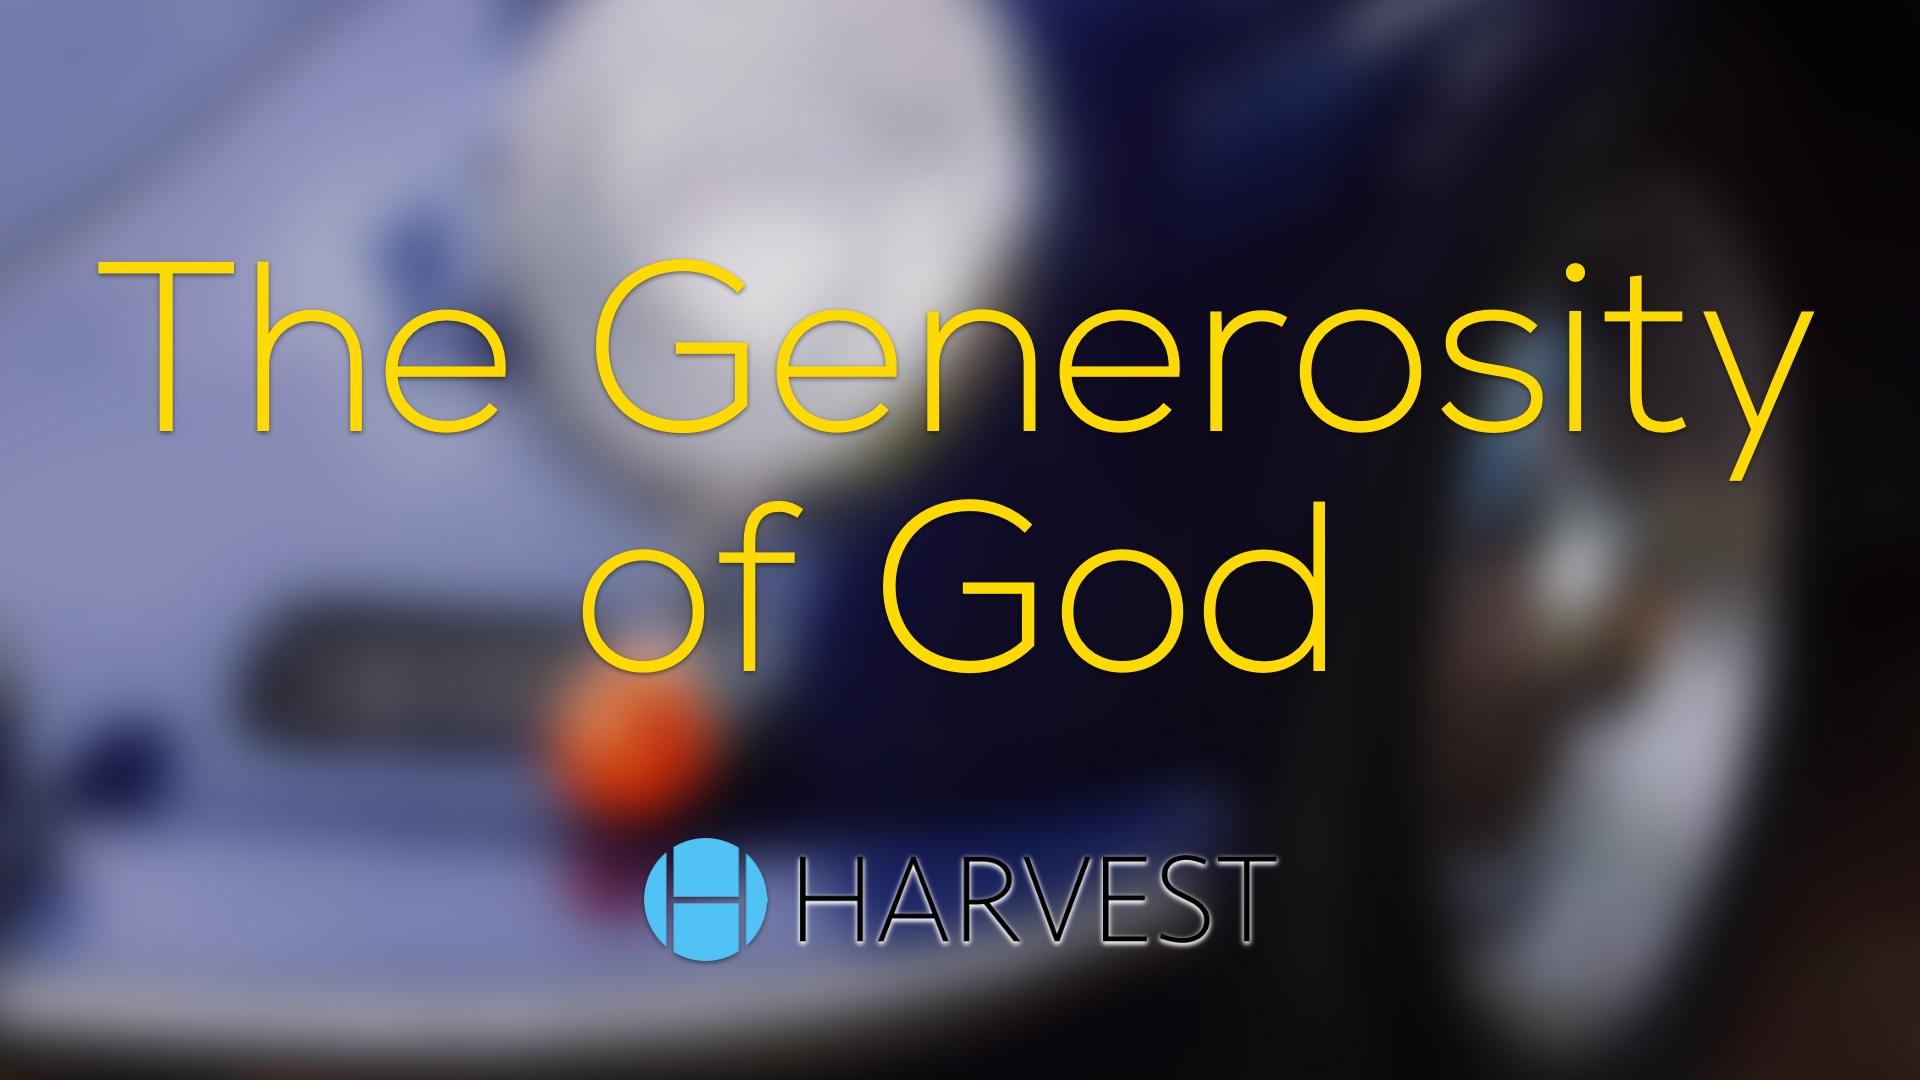 The Generosity of God: Abundance vs. Scarcity